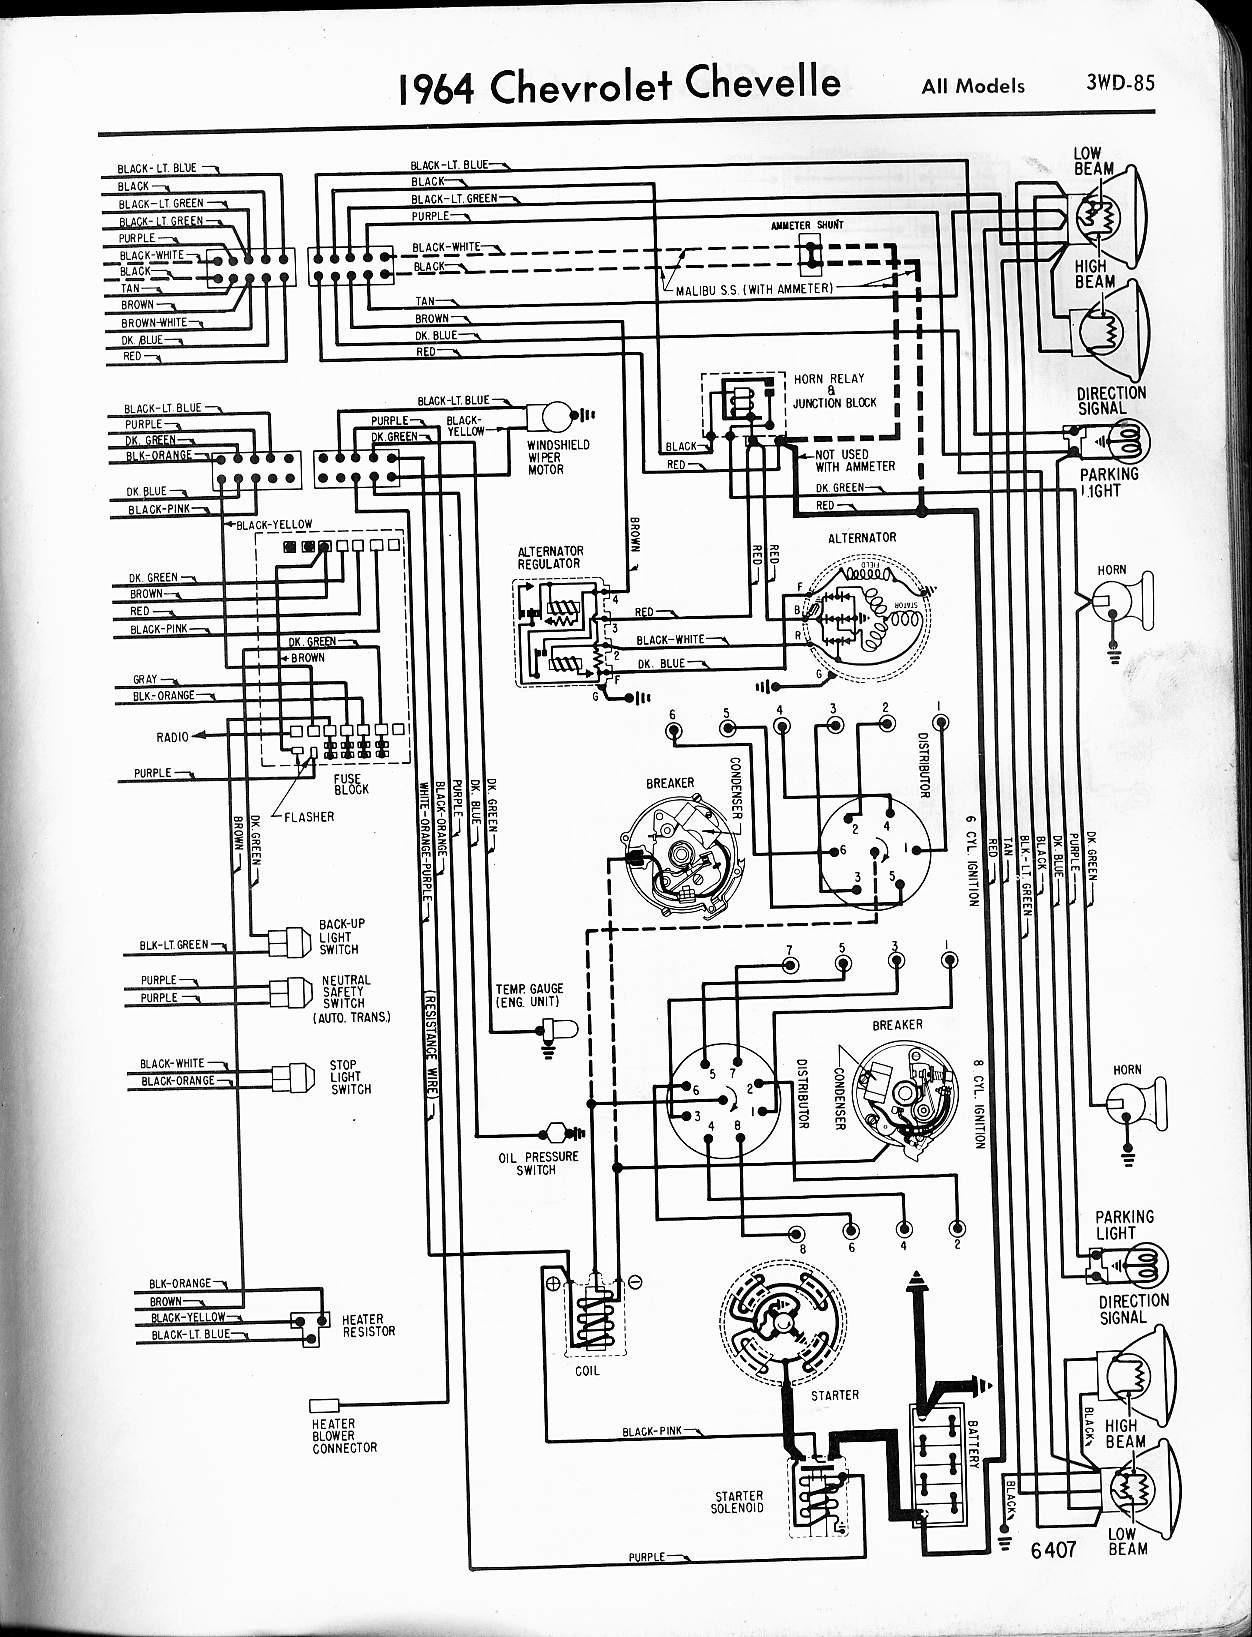 1964 impala wiper wiring diagram 1964 chevy impala turn signal wiring diagram e5 wiring diagram  1964 chevy impala turn signal wiring